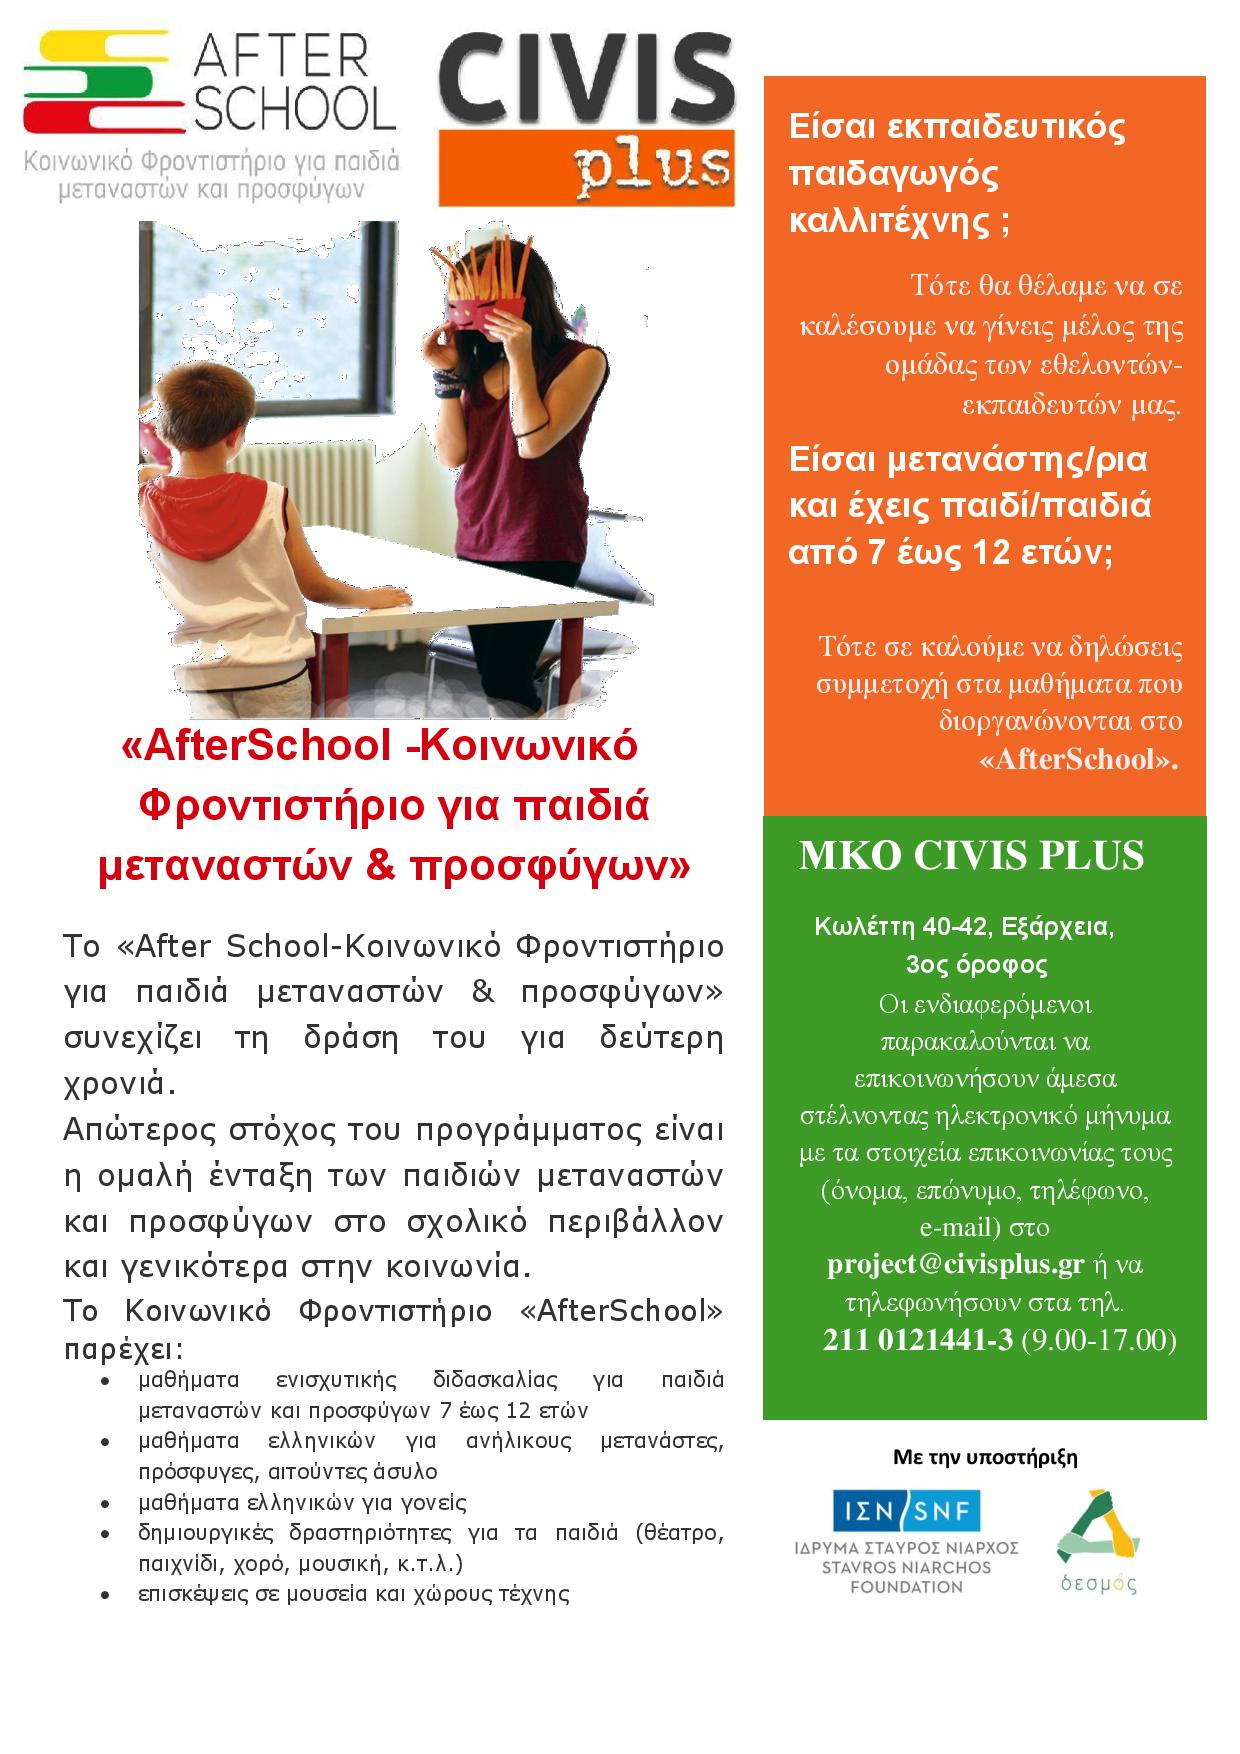 poster_after_school_socialpolicy-gr